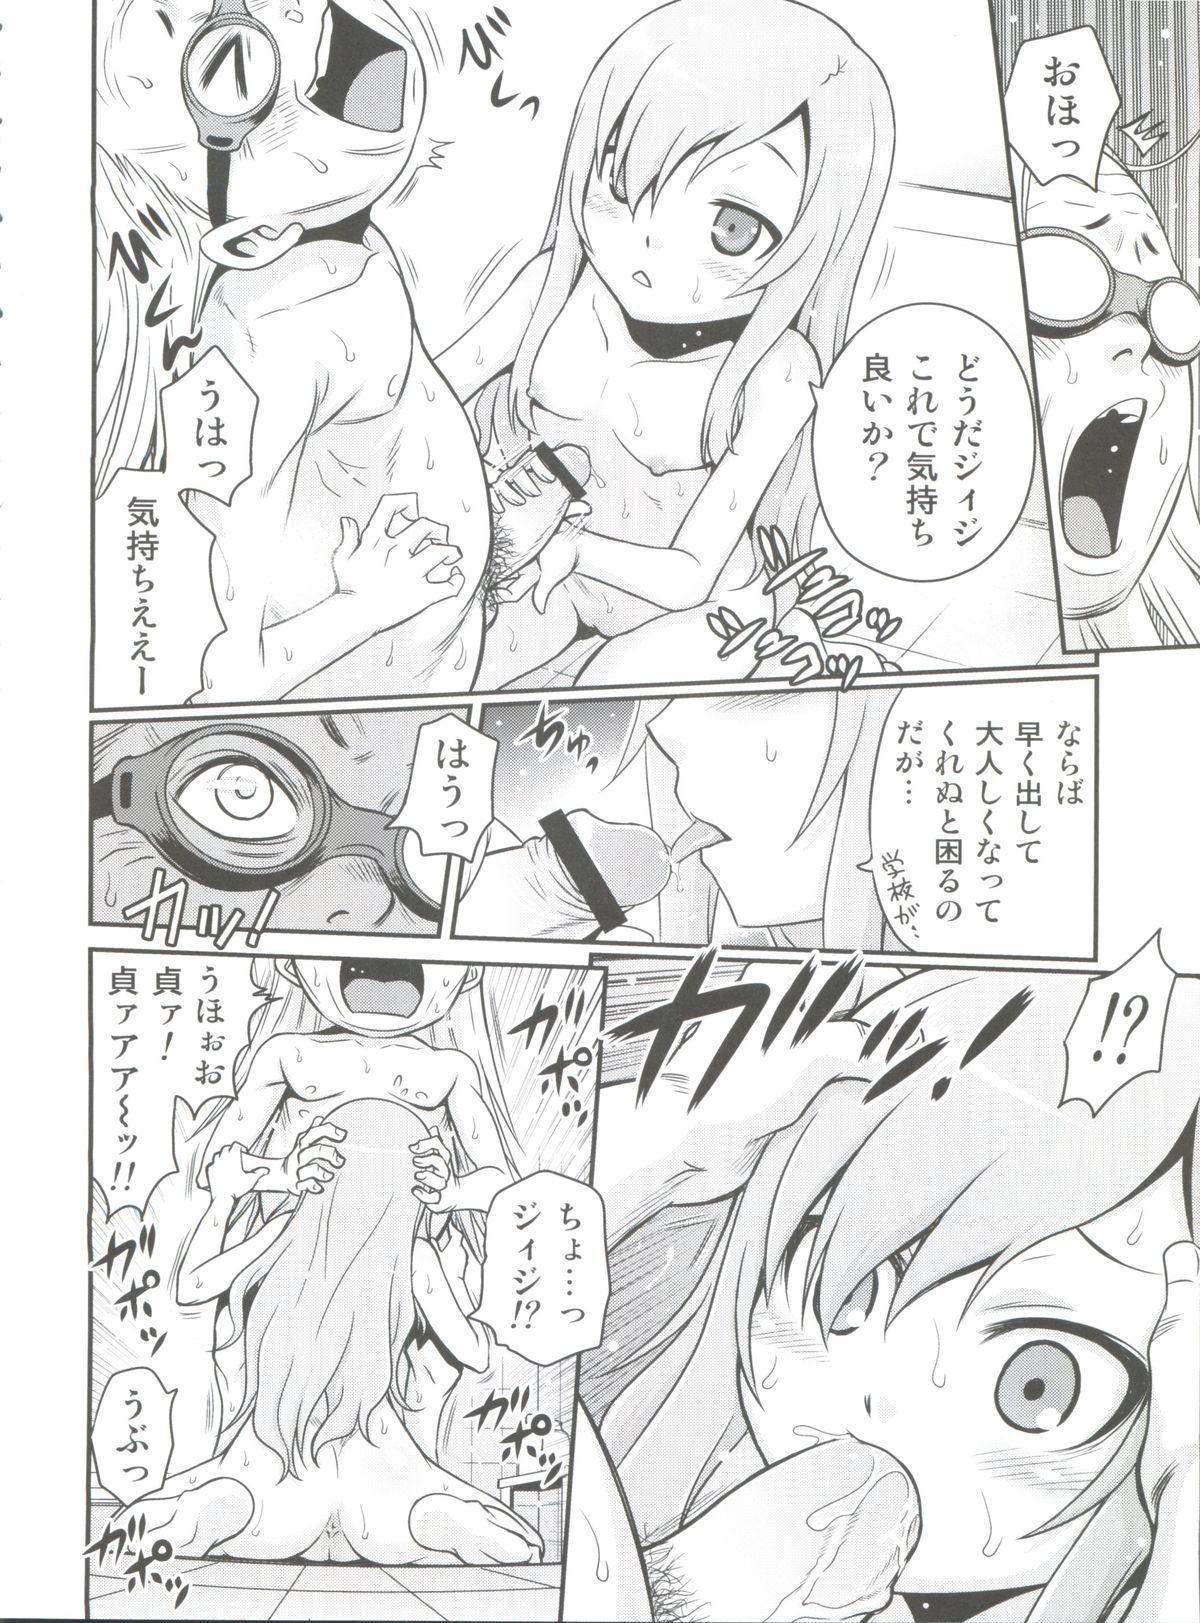 Mero Mero Furuya! 4